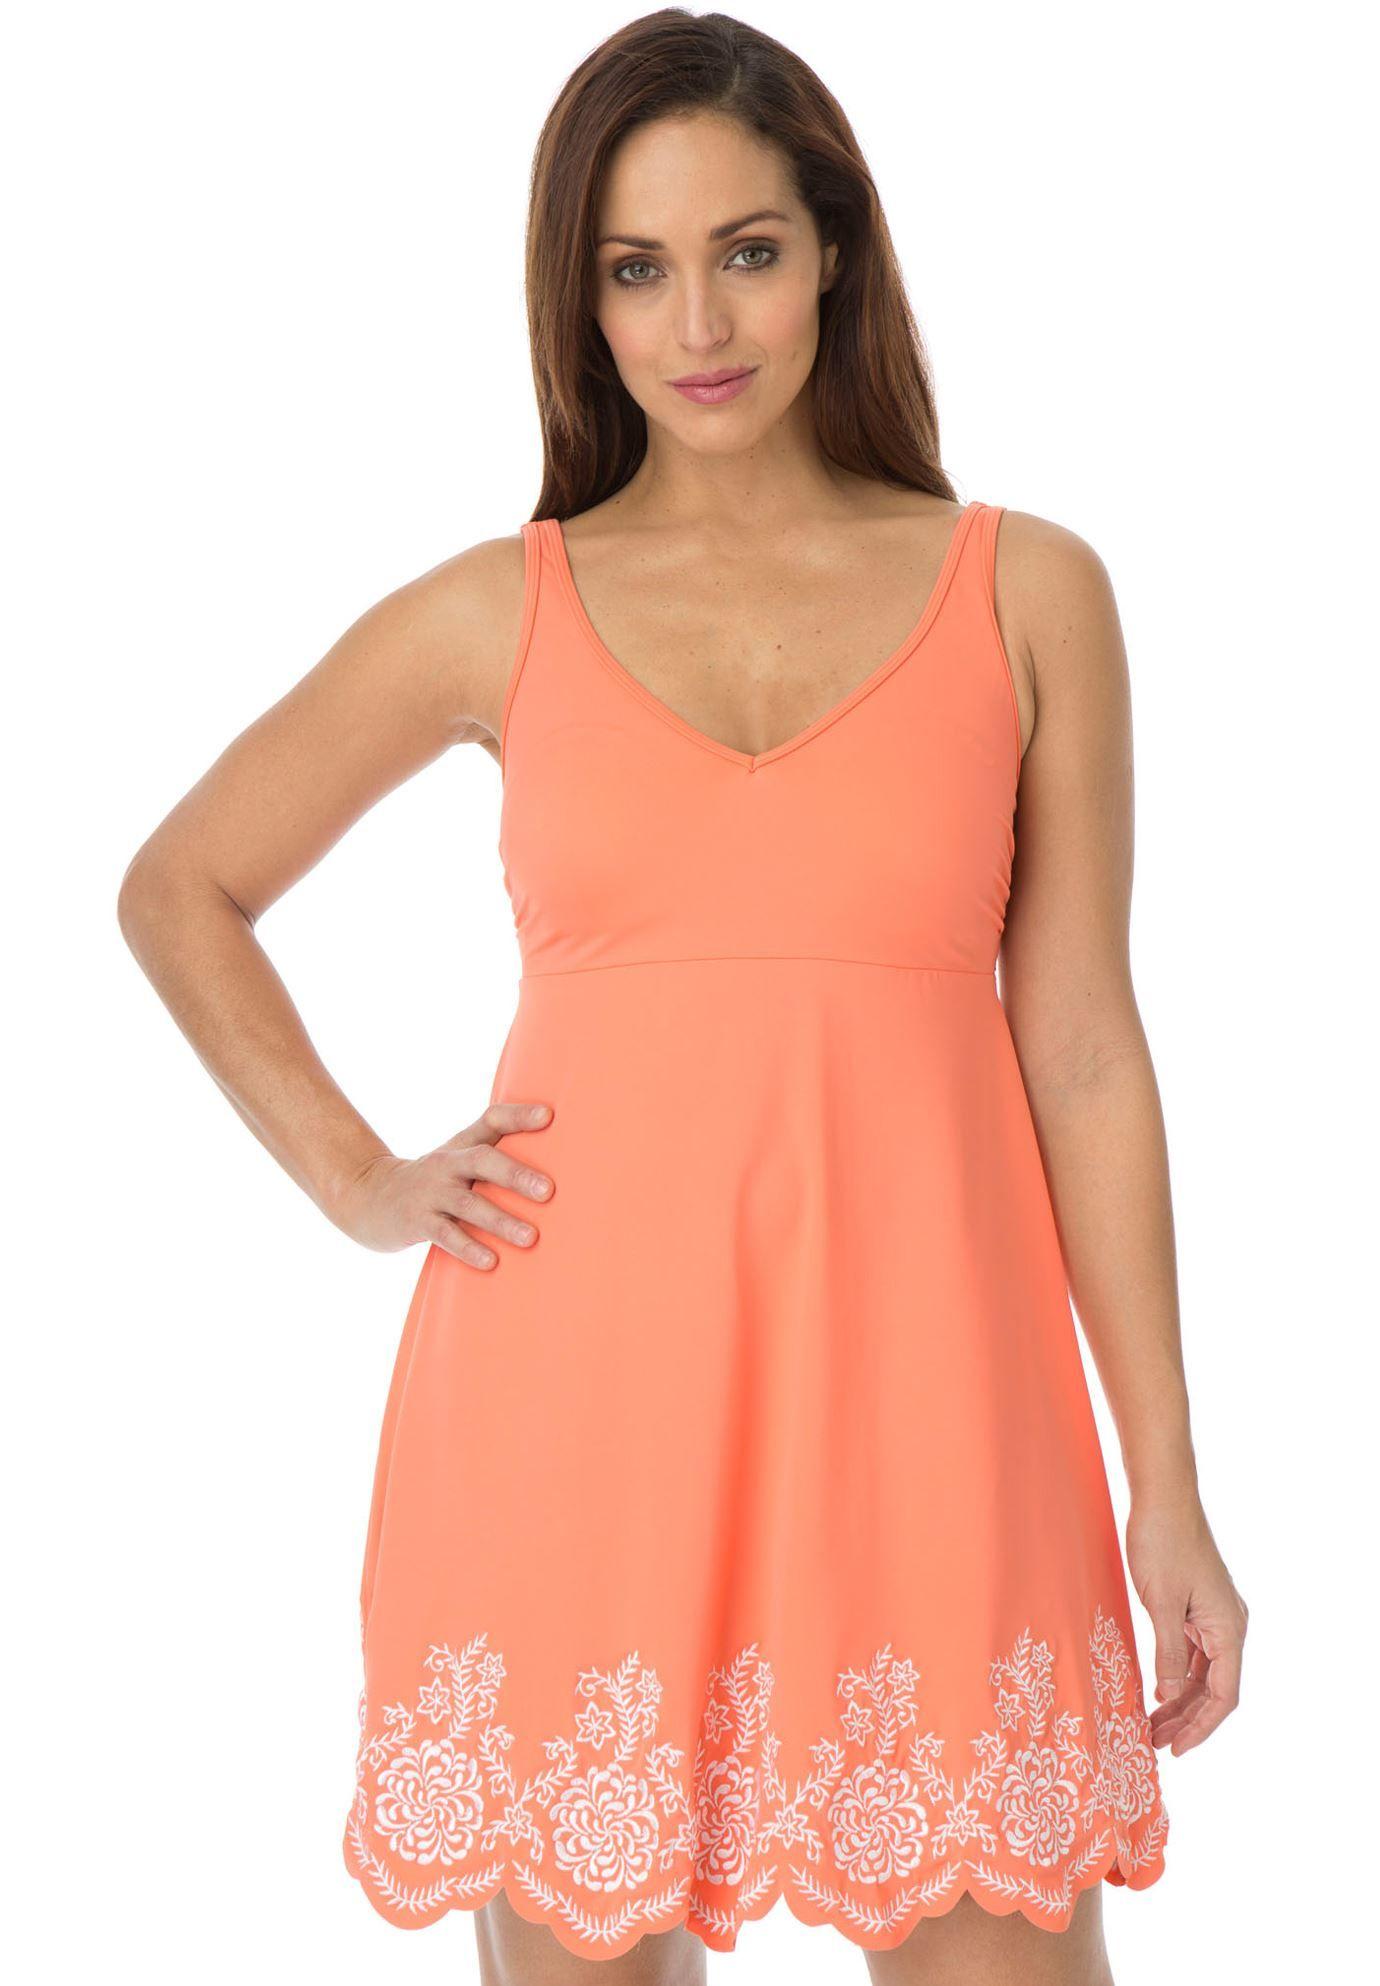 050194708ca New Arrivals Plus Size Modest Conservative Swimsuit One Piece Swimdress  3XL-6XL http:/